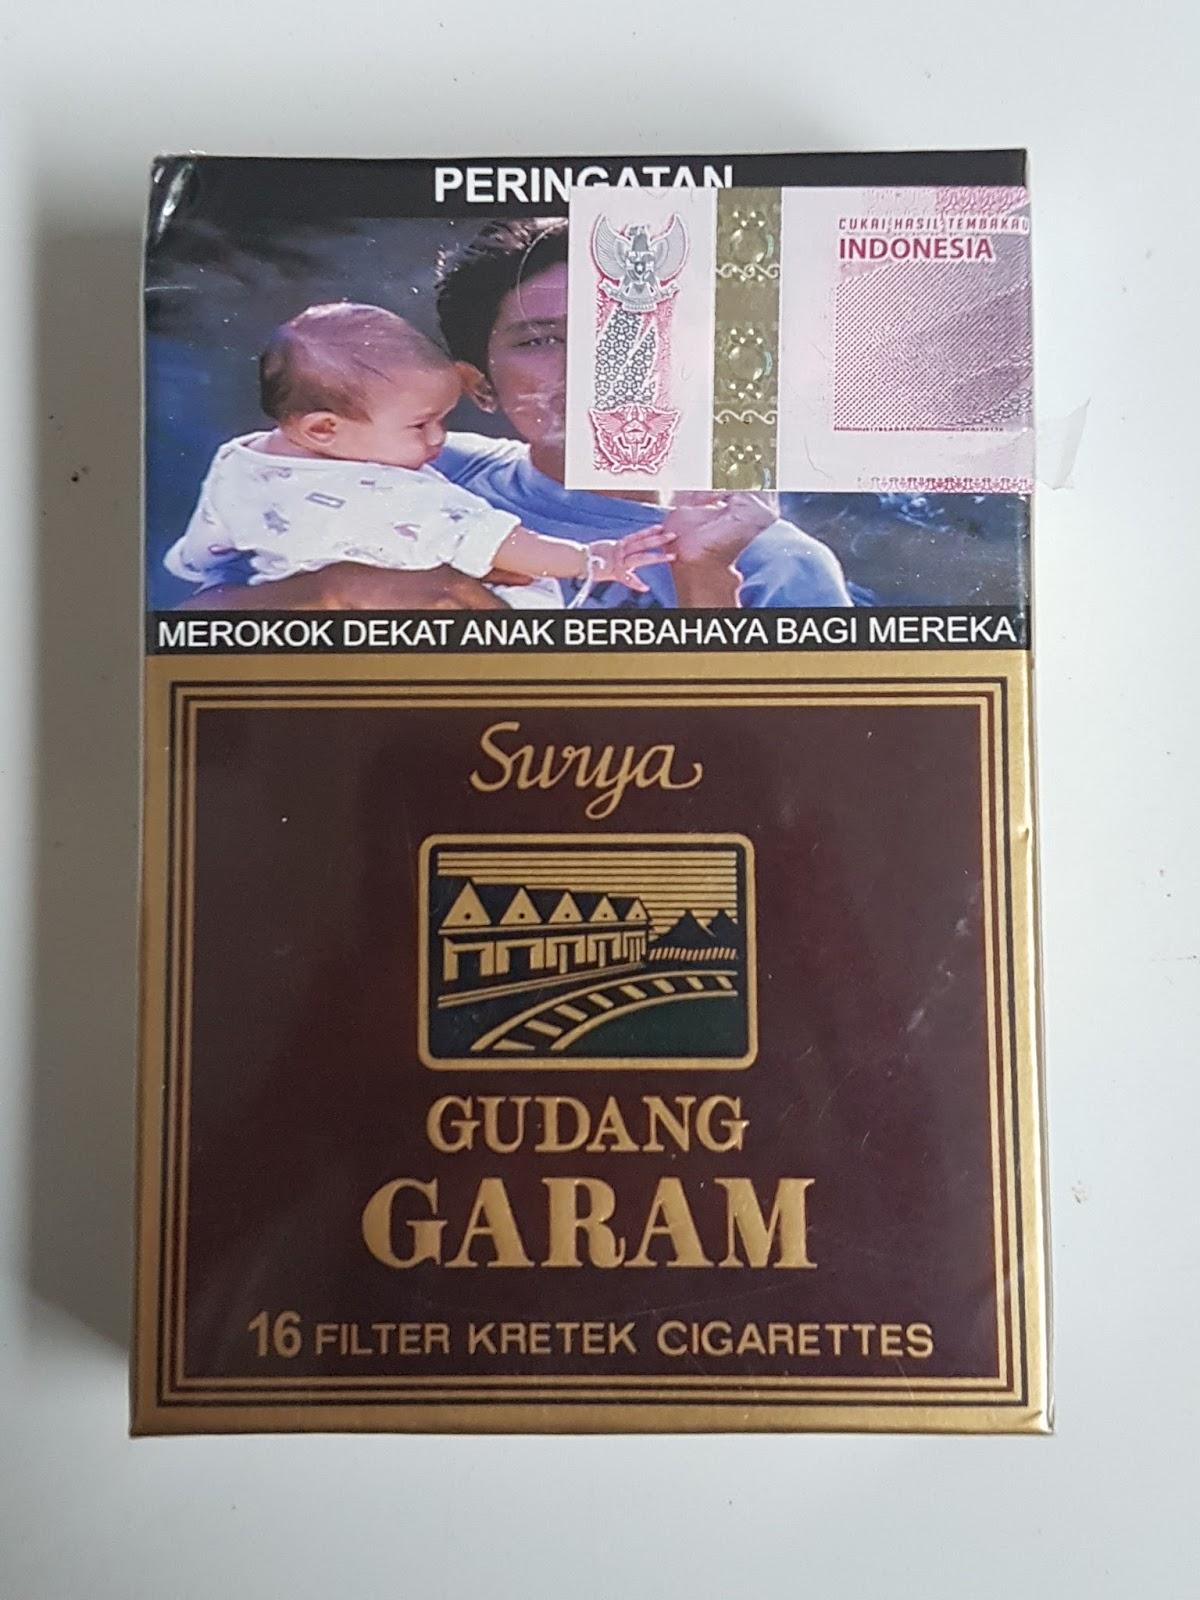 Gudang Garam Surya 16 SKM Full Flavor Ukuran Long Size